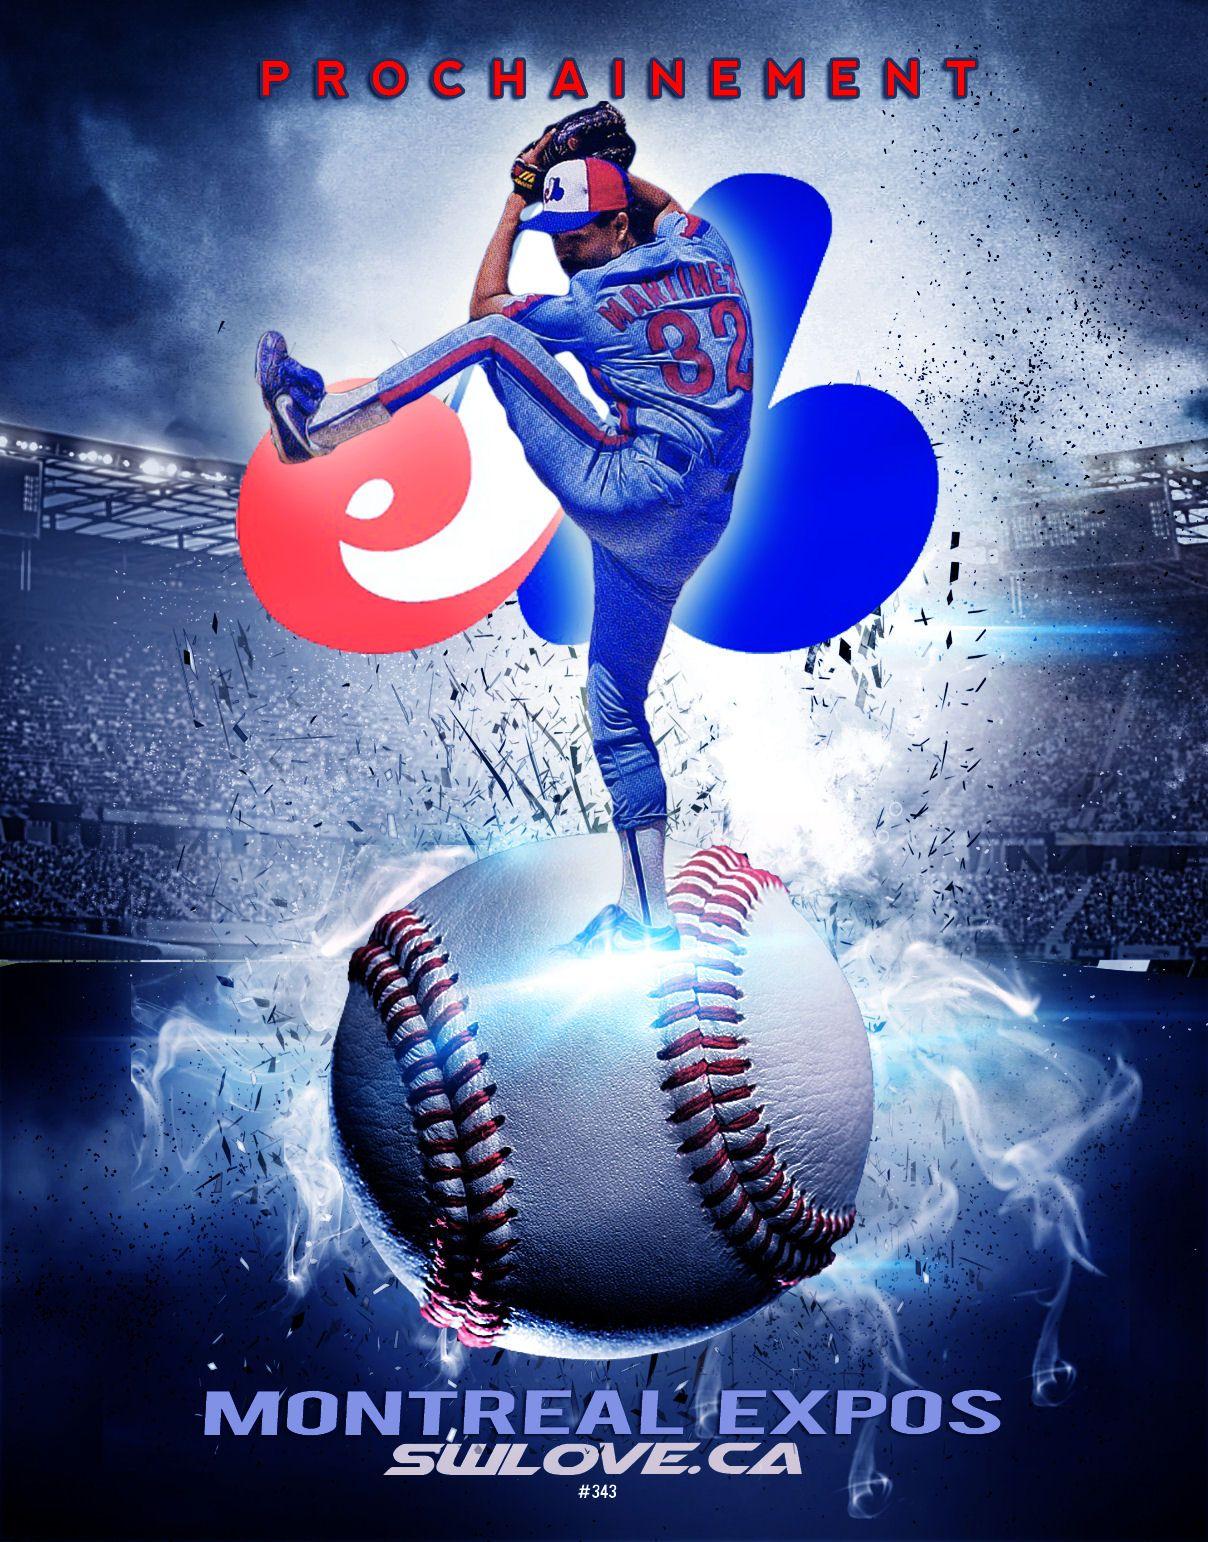 Montreal Expos Expos montreal, Expos, Mlb baseball teams